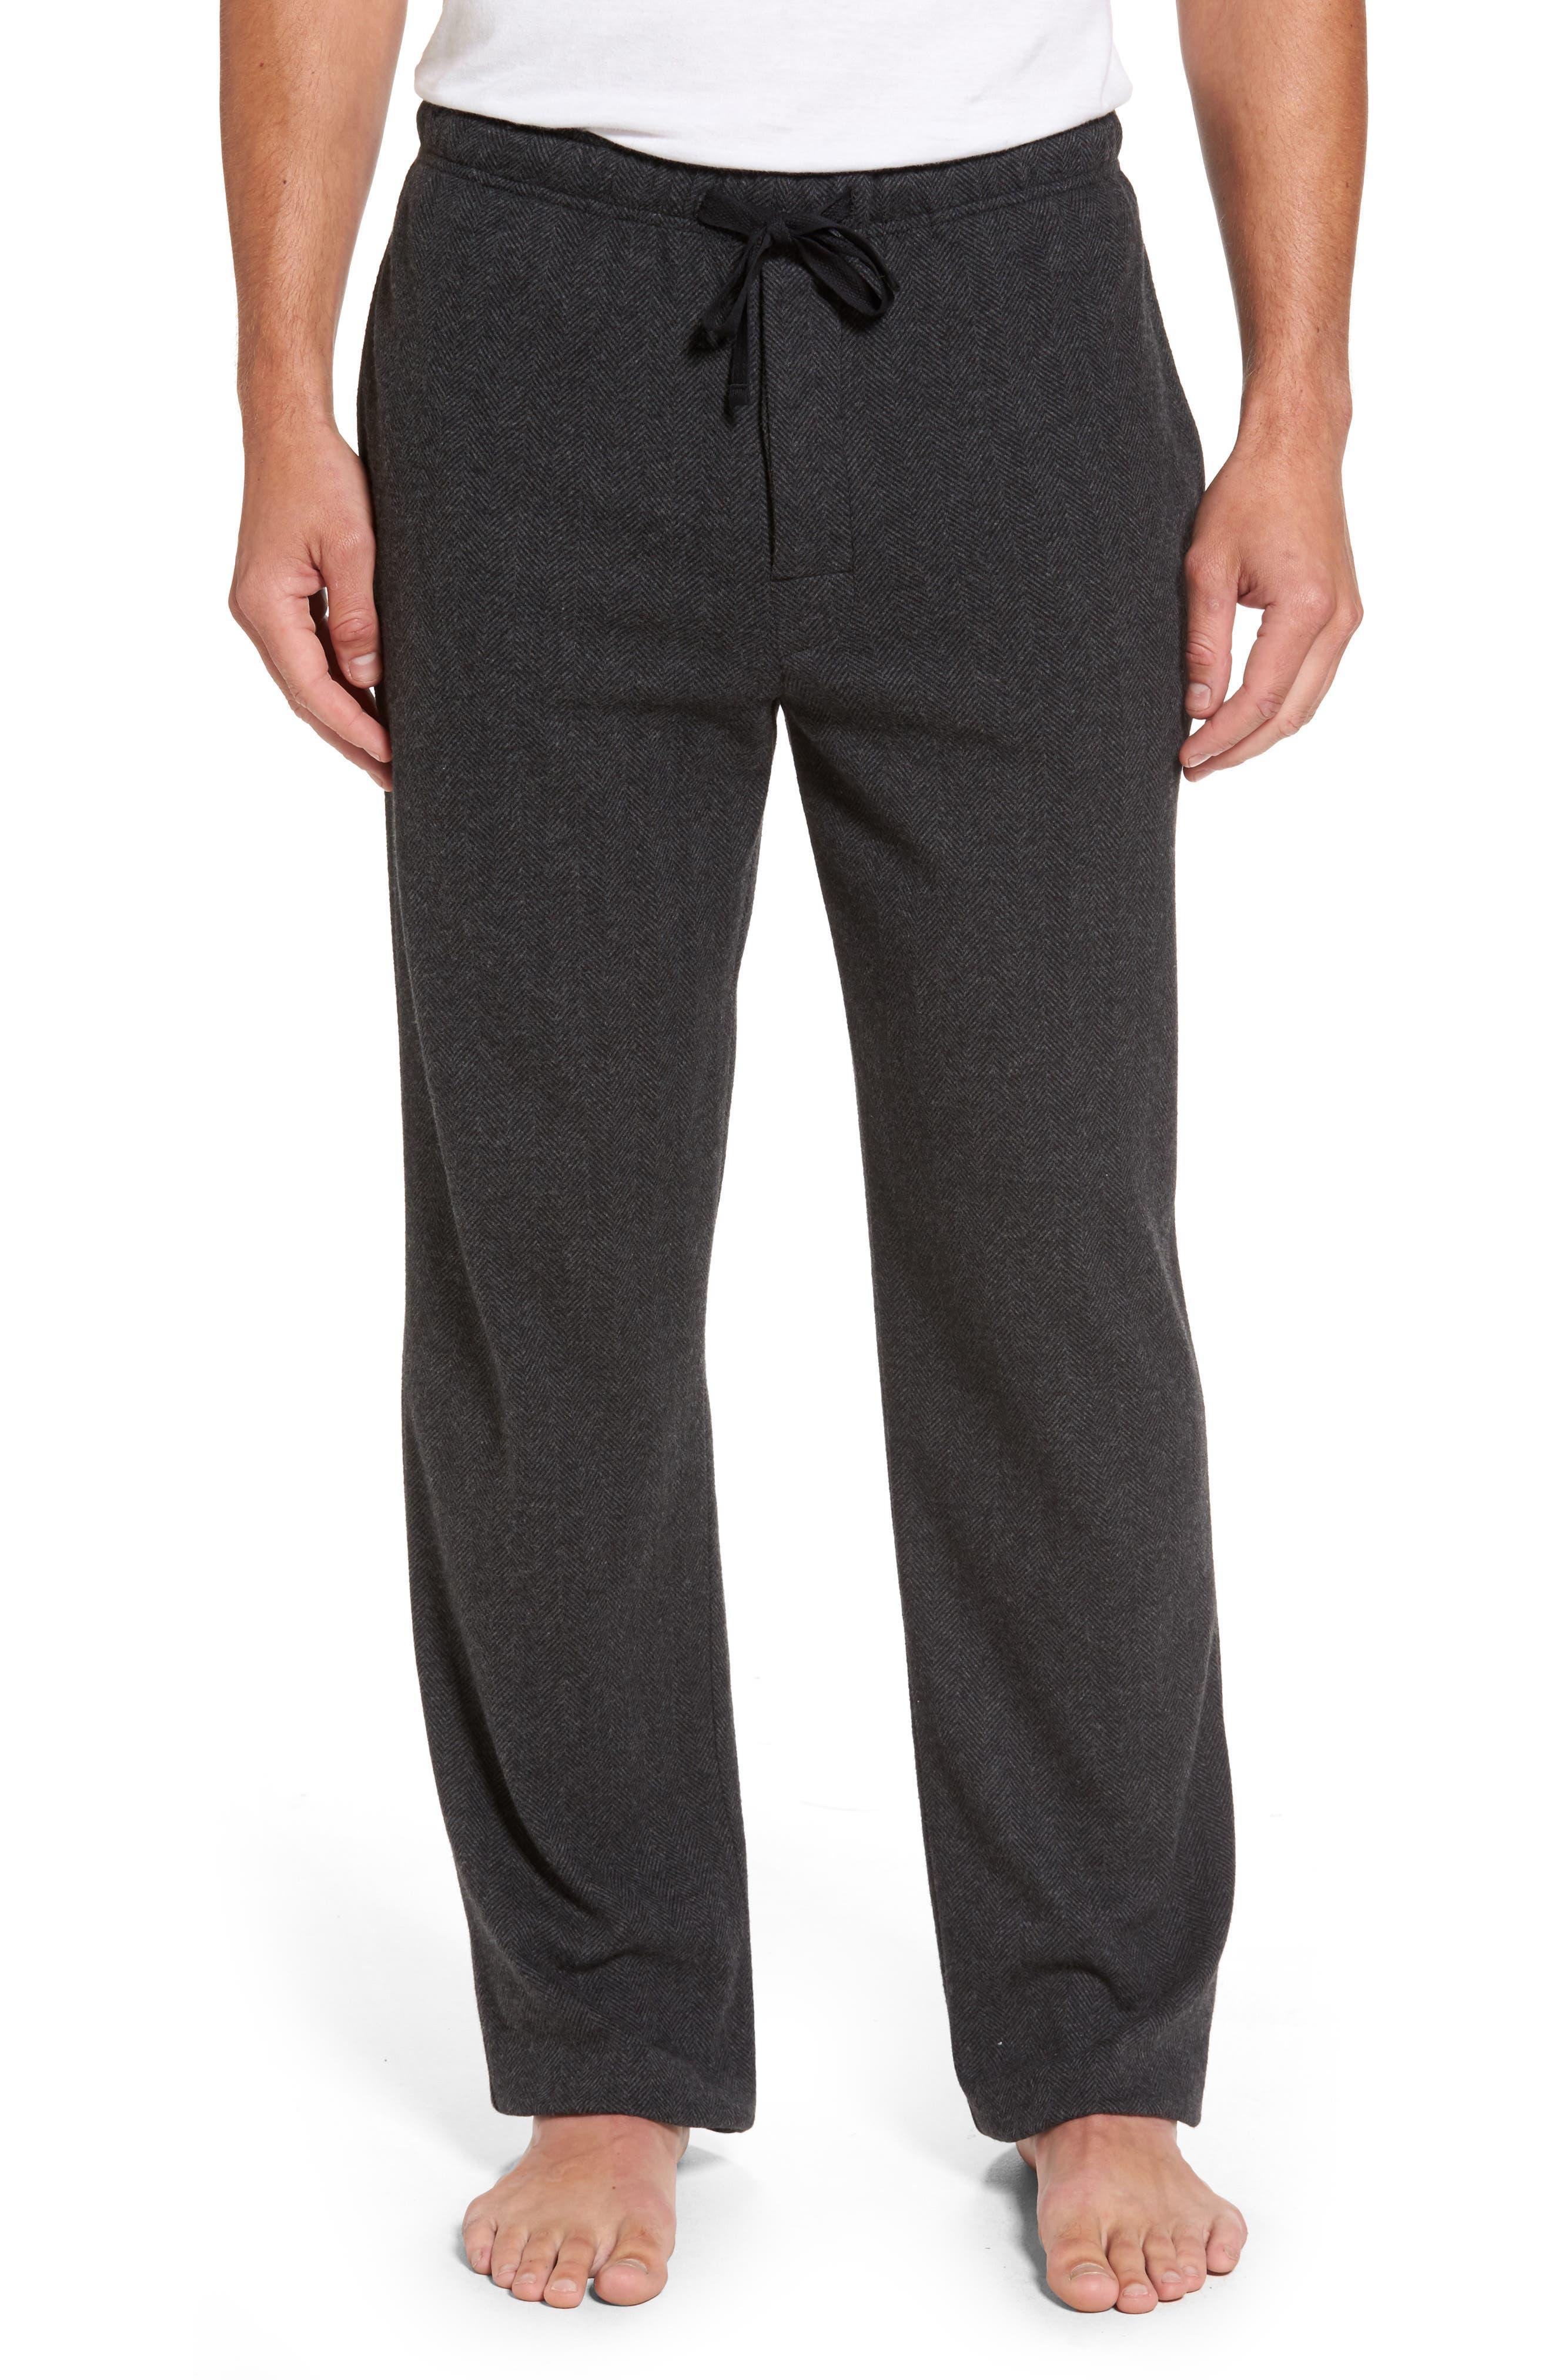 Grayson Lounge Pants,                             Main thumbnail 1, color,                             030